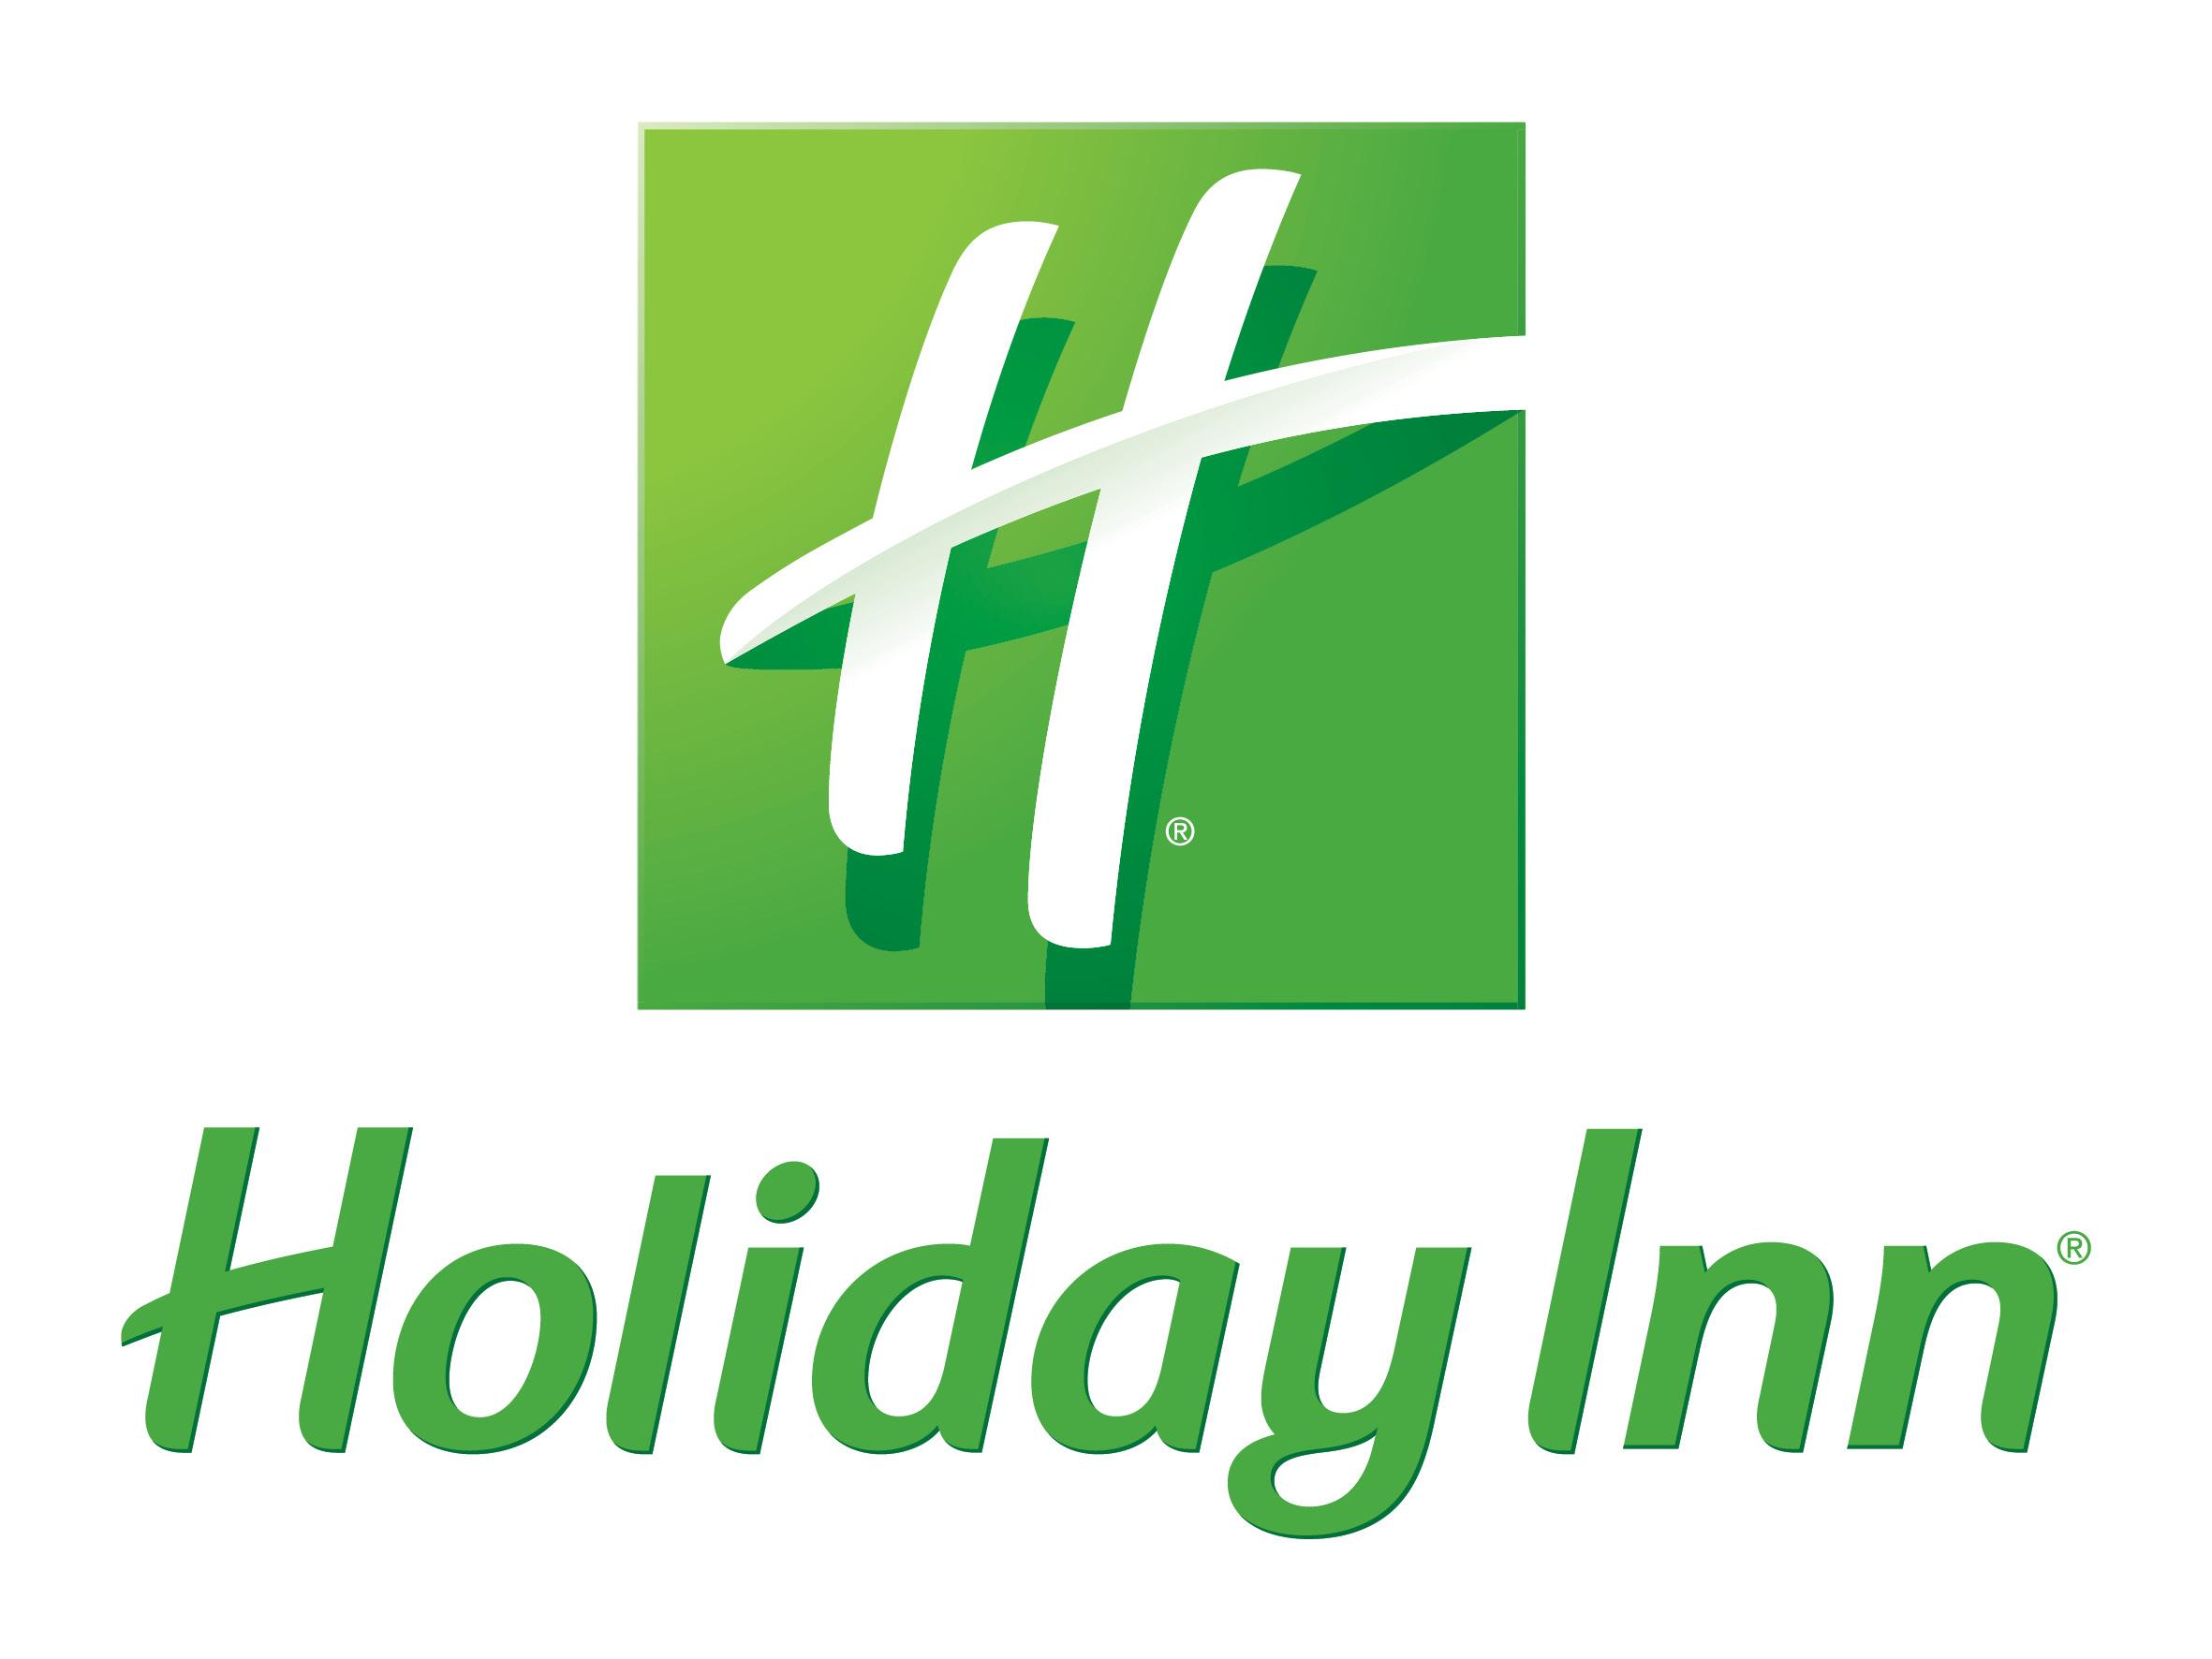 HI 4C logo